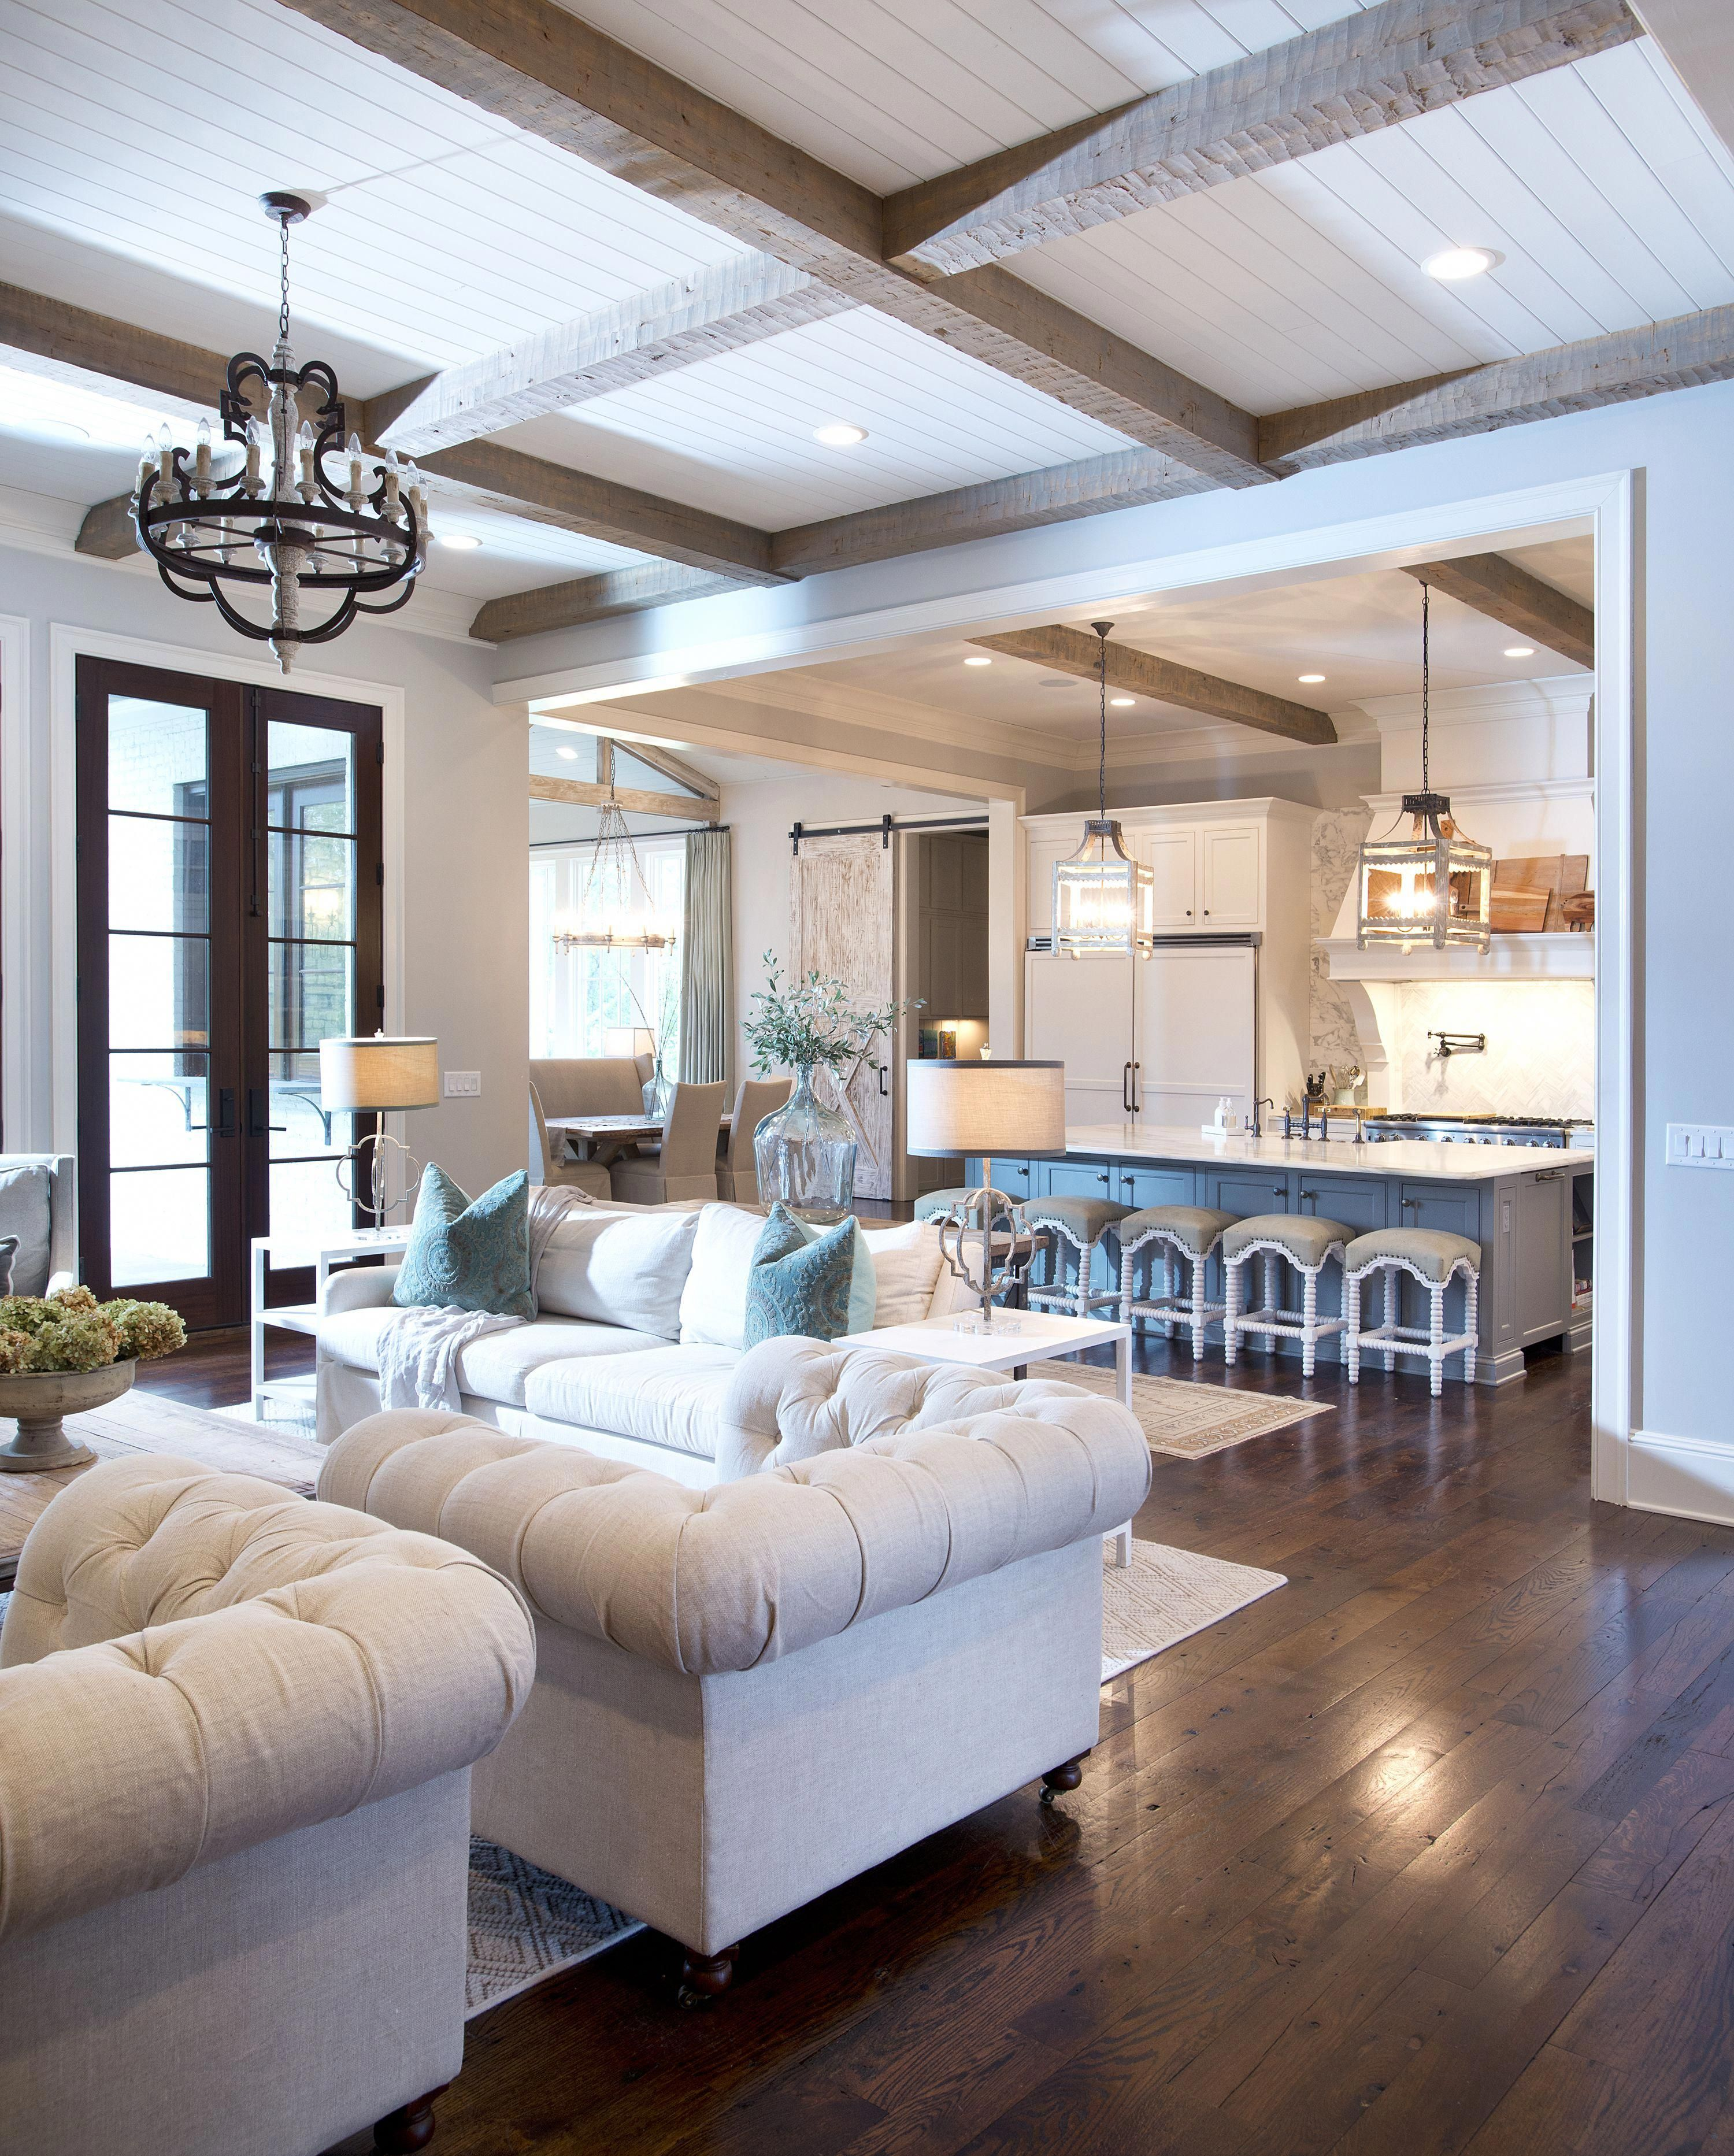 homeinteriordecorationbeams | living room design inspiration